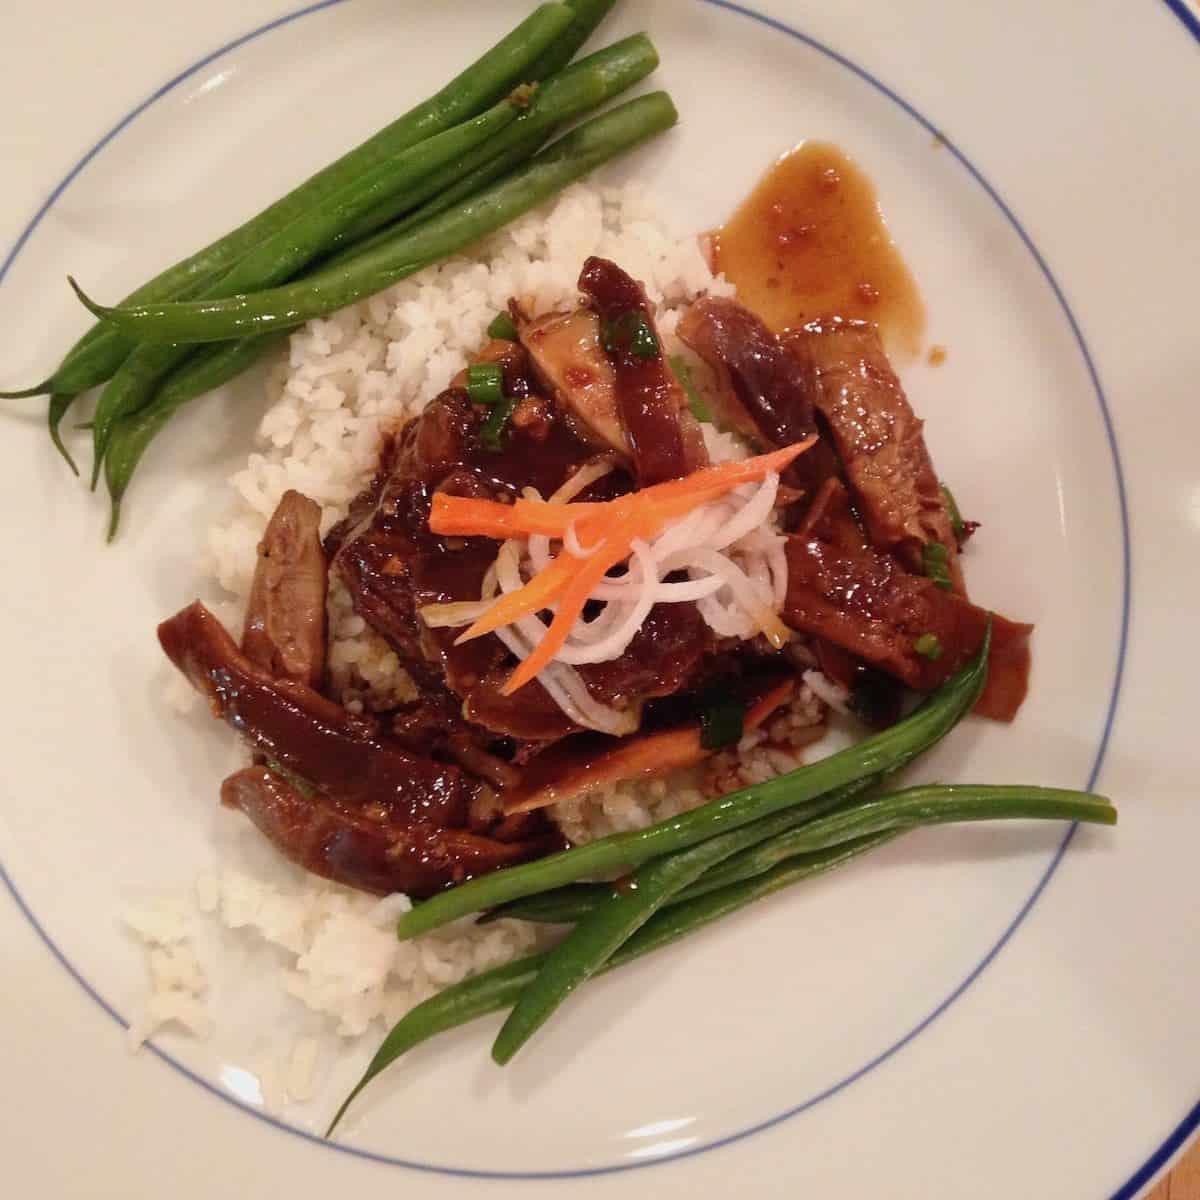 Asian short ribs with shitakes, pickled daikon/carrot, golden Carolia rice and haricot vert